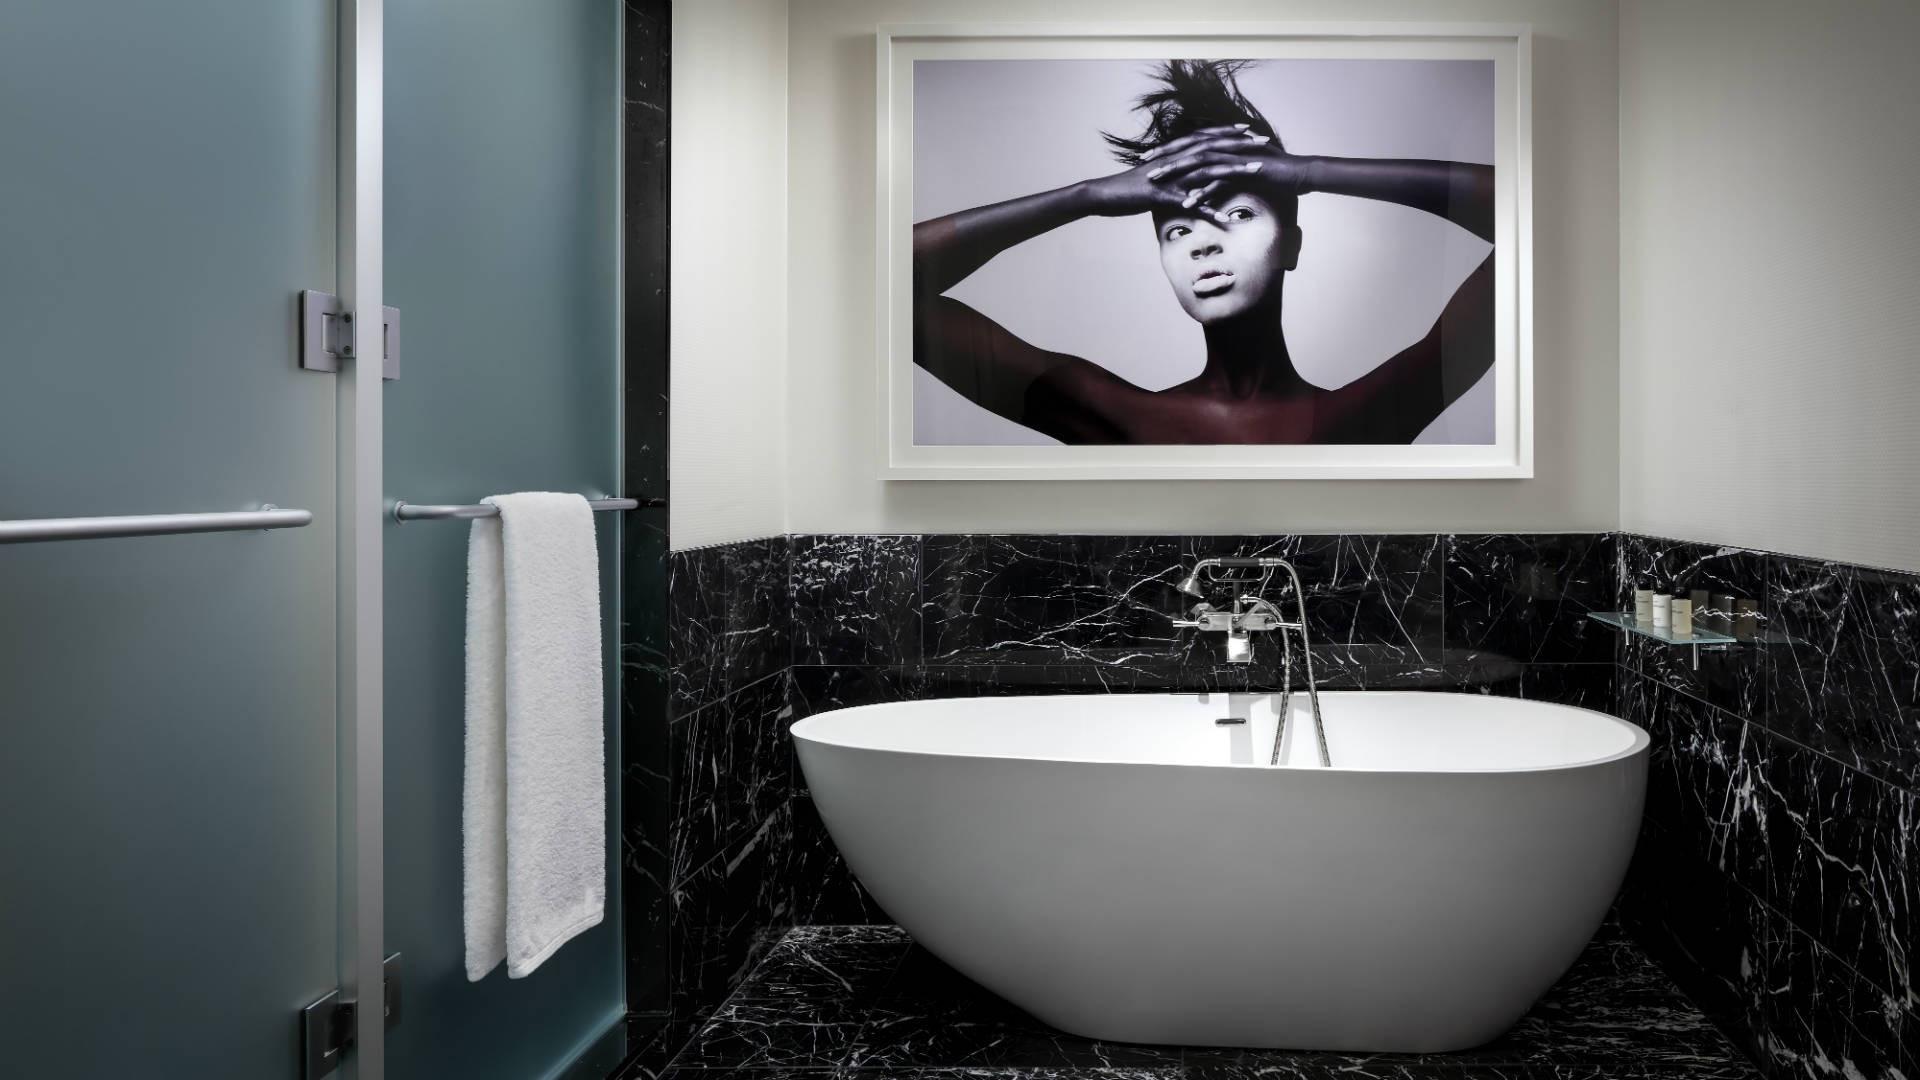 Best hotels Toronto staycation | The Bisha Hotel ensuite bathroom